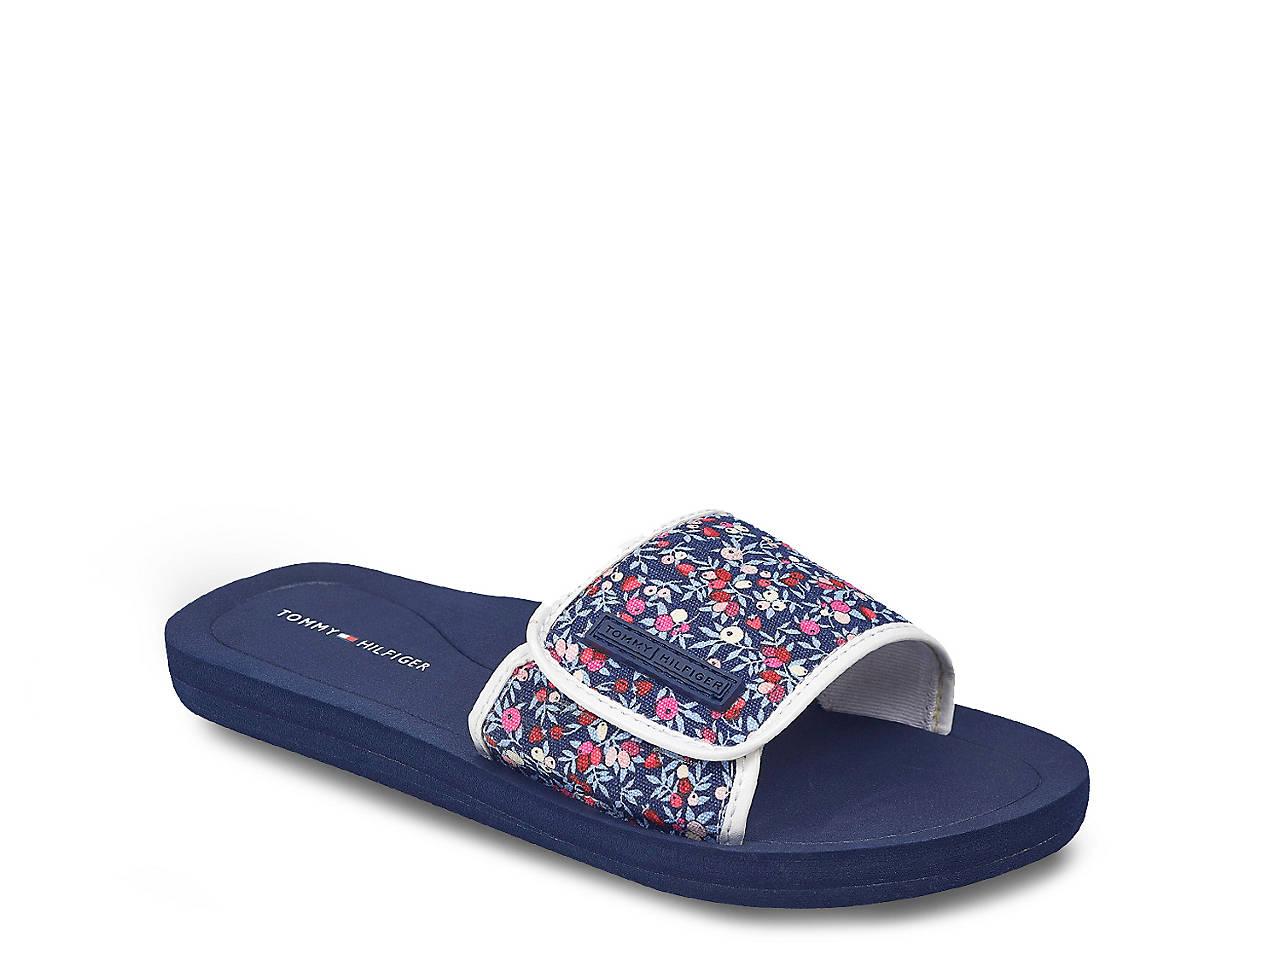 4da9645ae9c4 Tommy Hilfiger Mysha Slide Sandal Women s Shoes